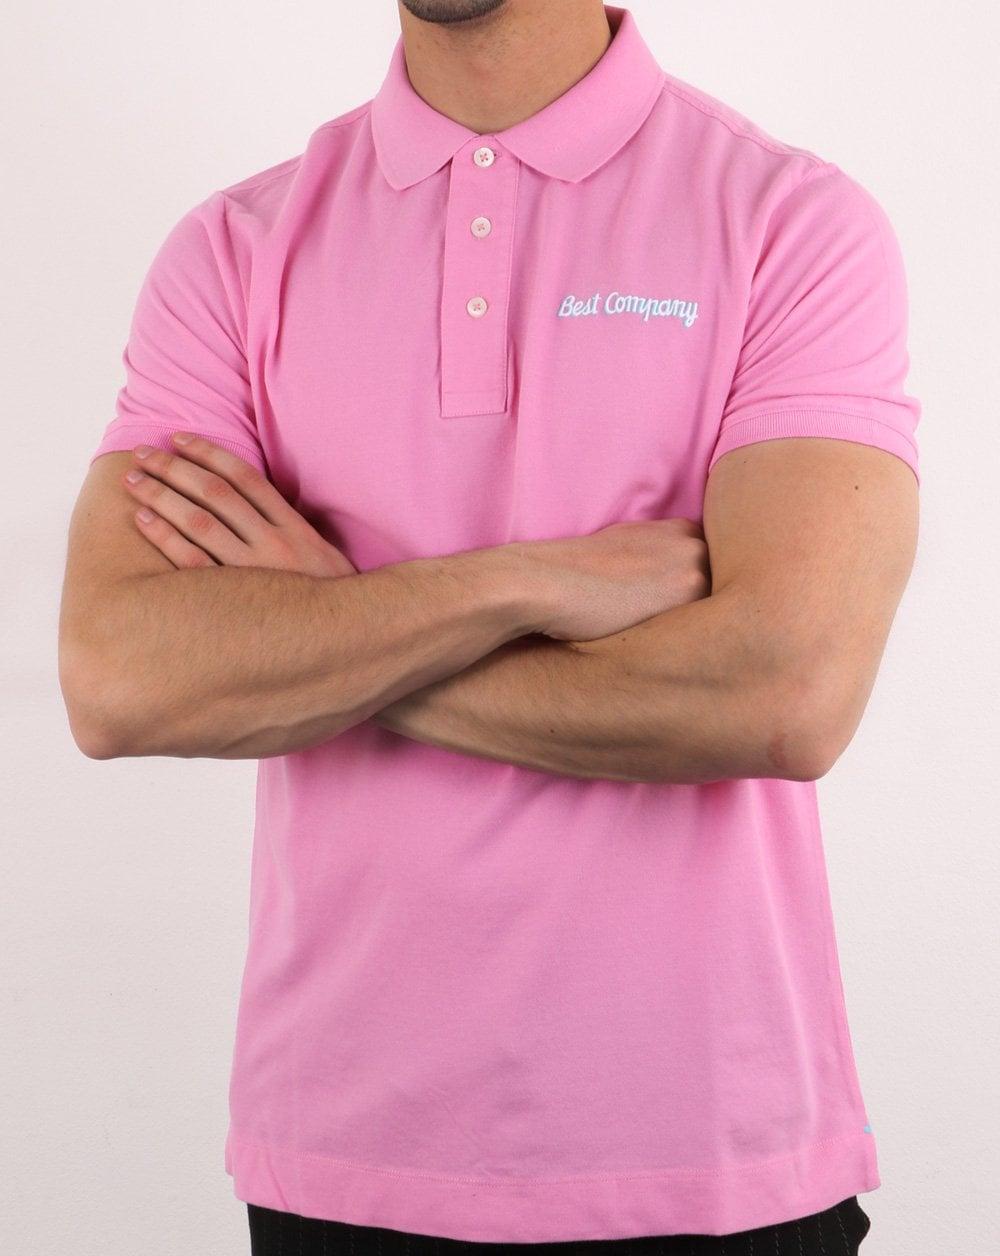 f1a246c1e Best Company Pink Polo Shirt | 80s Casual Classics